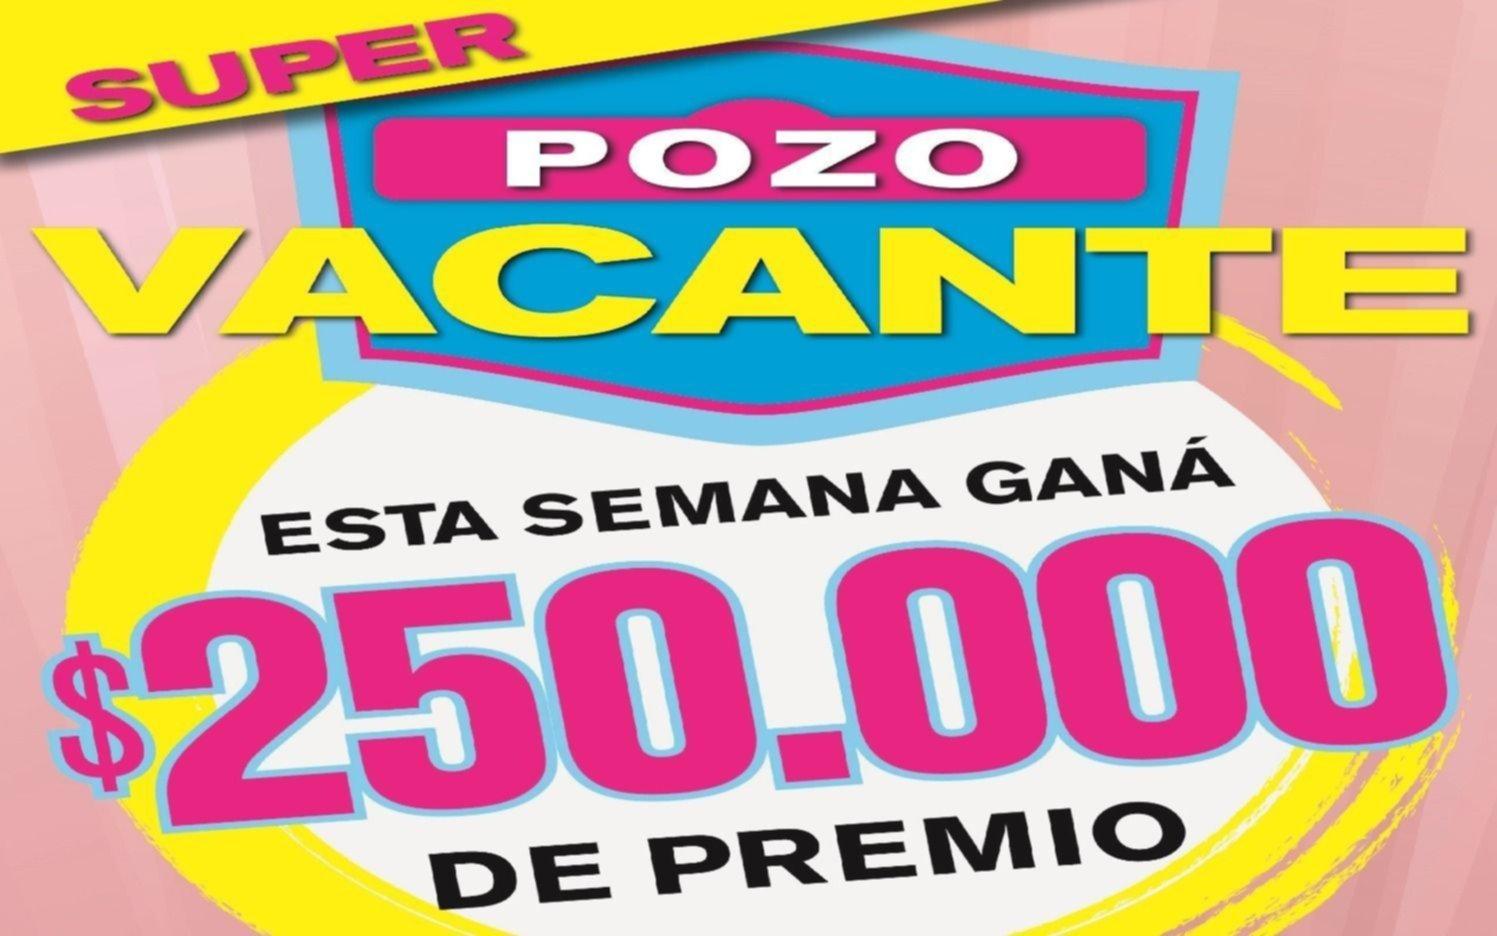 Controlá el Cartonazo: esta semana entrega un suculento premio de $250.000